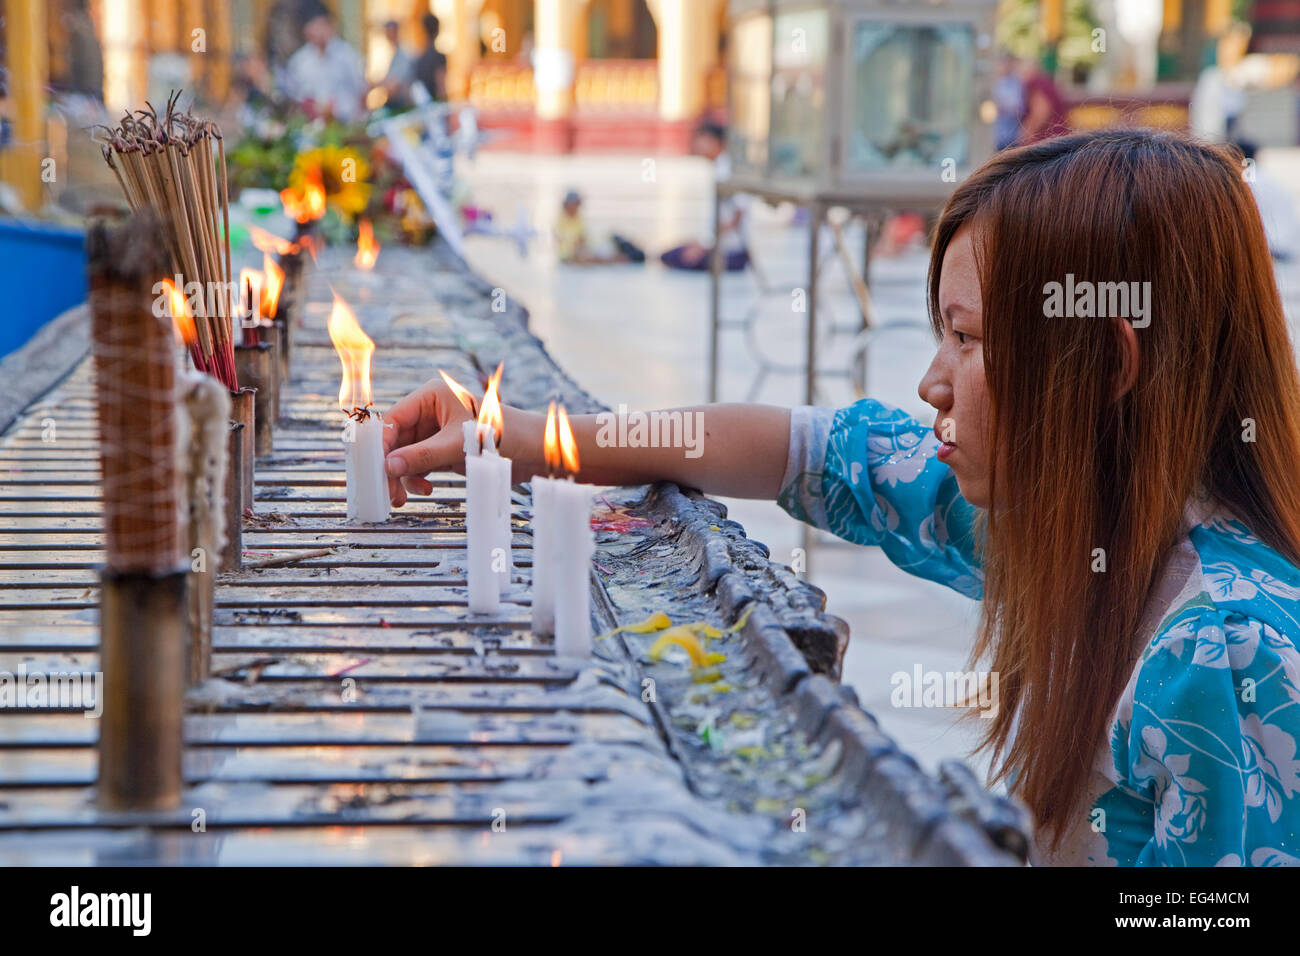 Burmese girl burning candles and incense sticks / joss sticks in the Shwedagon Zedi Daw Pagoda at Yangon, Myanmar - Stock Image